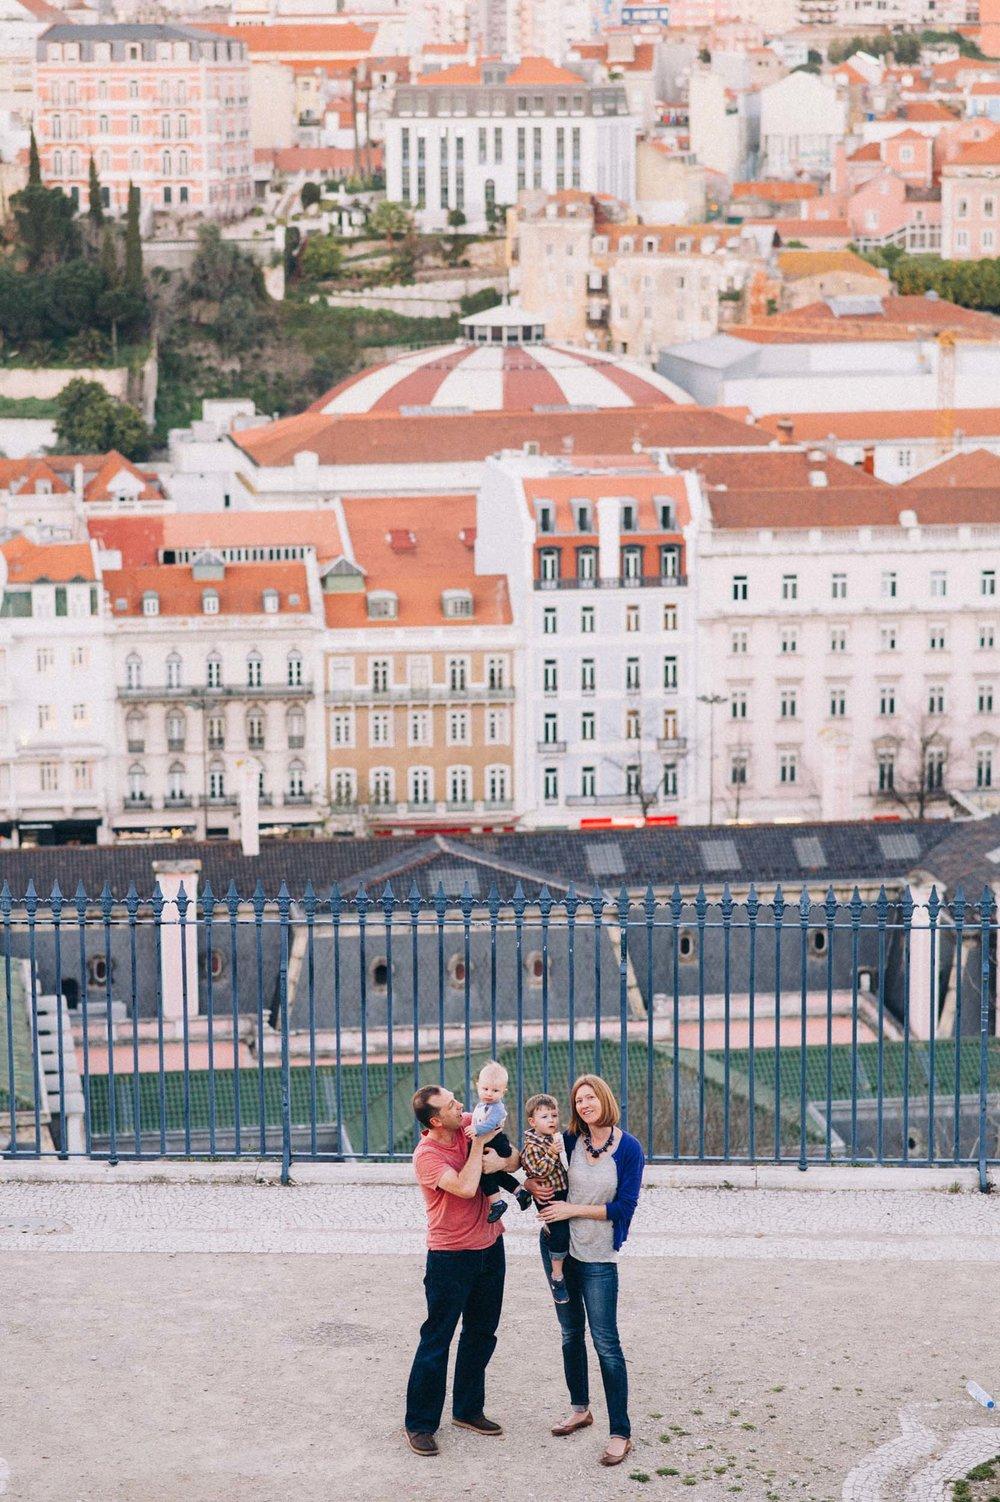 Flytographer: Cláudia in Lisbon